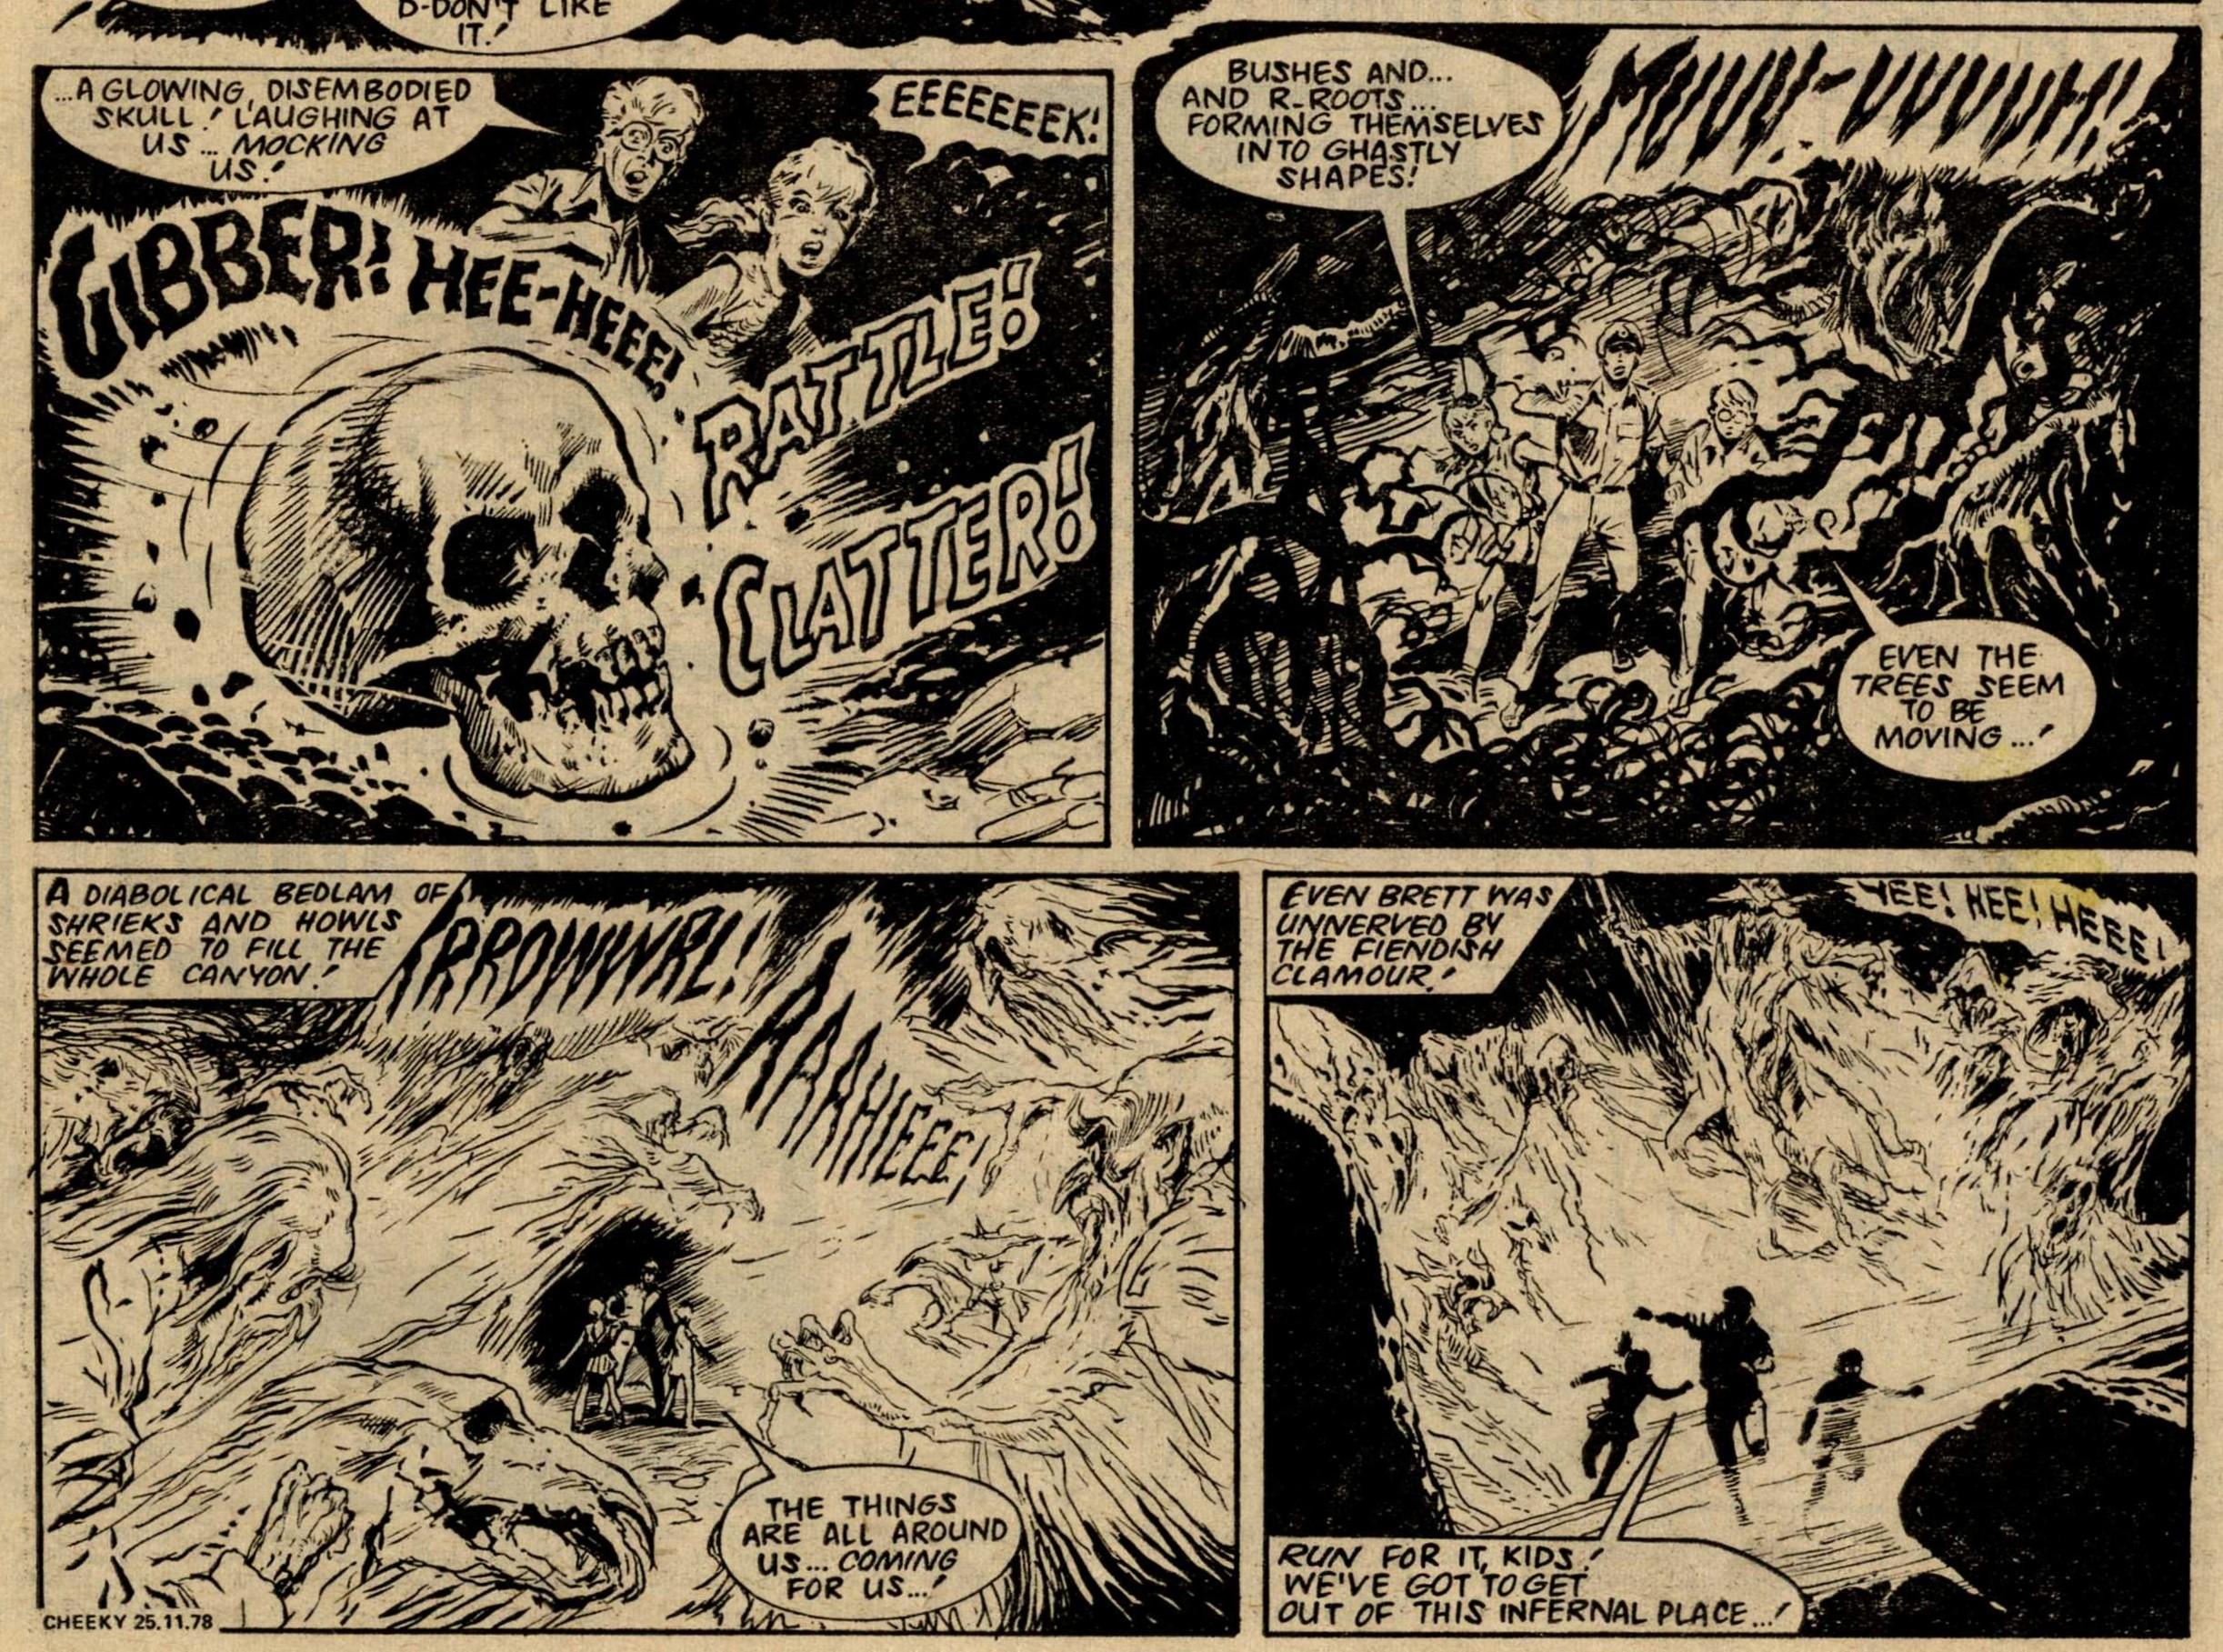 The Terrible Trail to Taggart's Treasure: Eric Bradbury (artist)